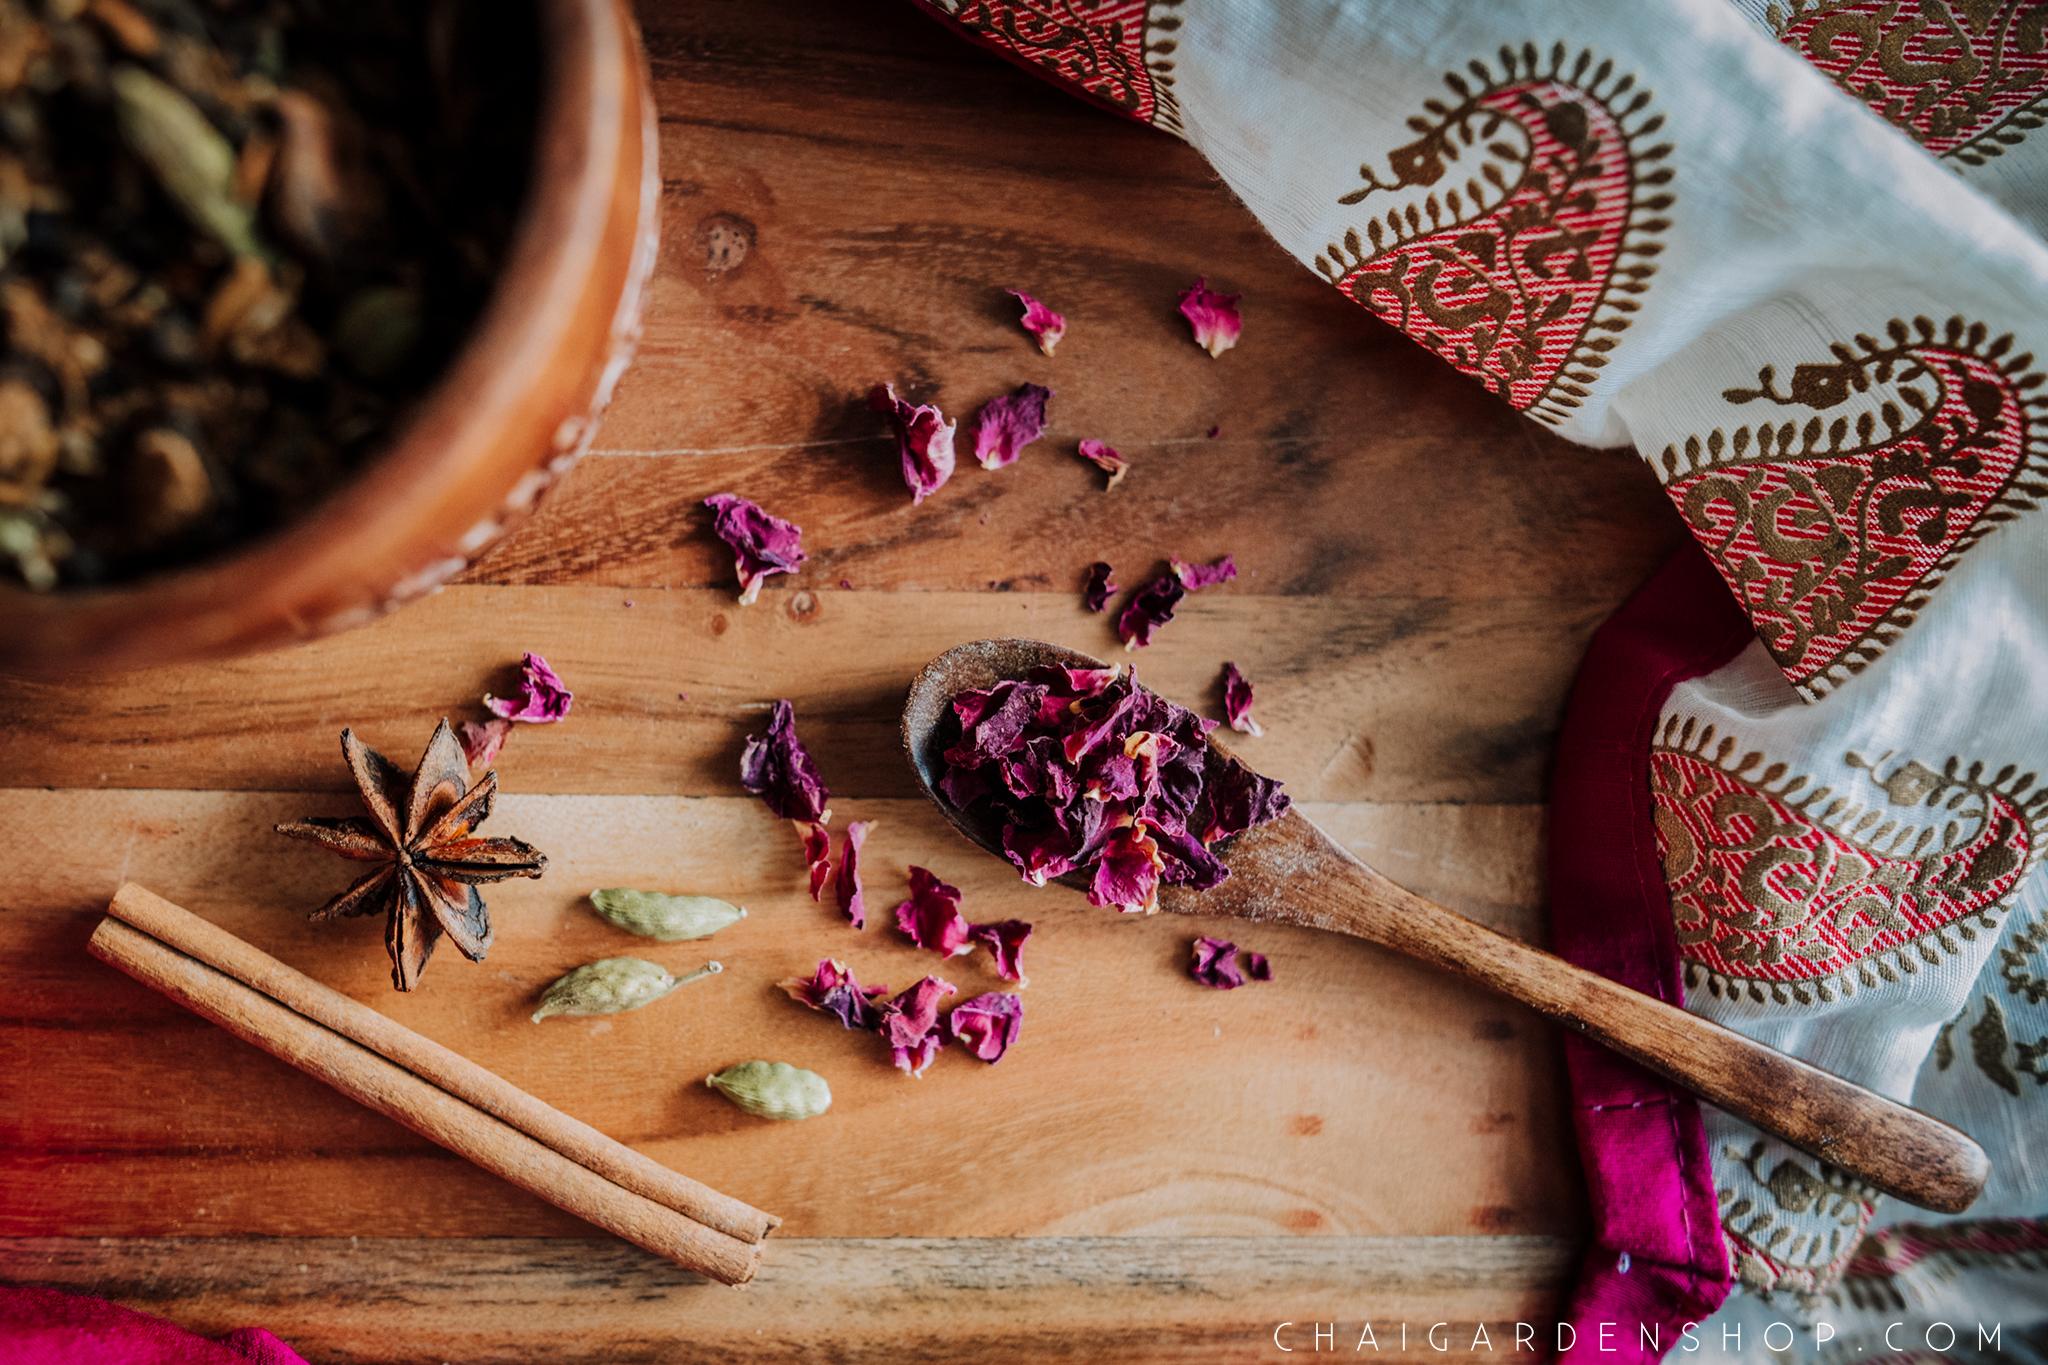 rose petal chai, organic rose petals, organic chai, rose petal tea, chai garden, authentic chai recipe, herbal chai